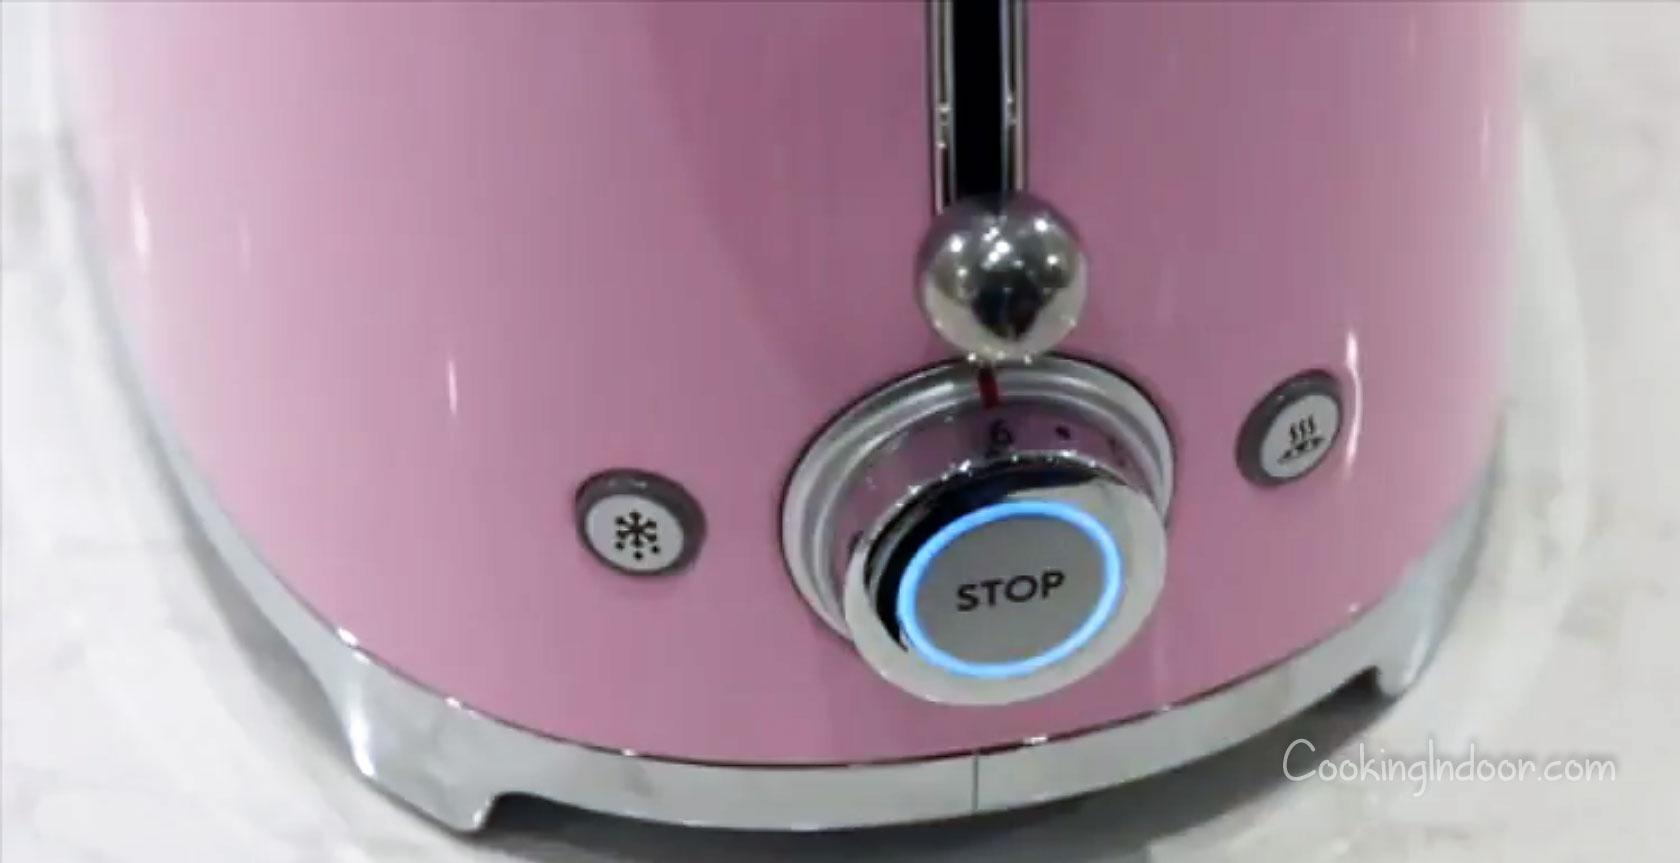 Best designer toaster